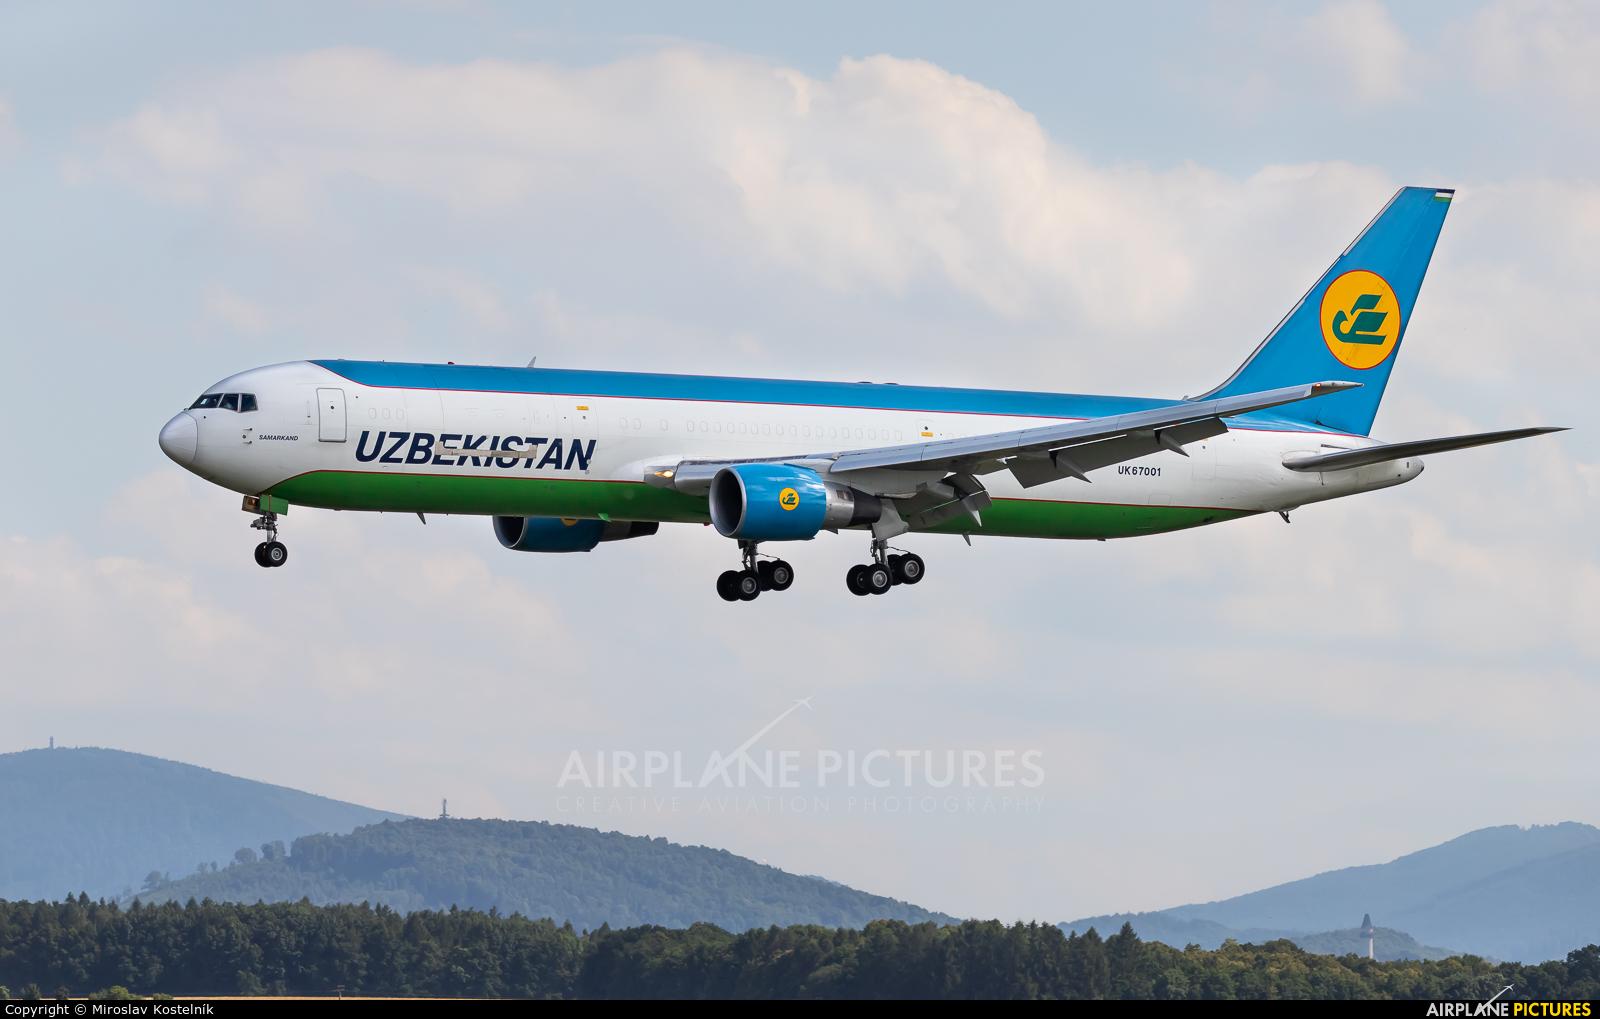 Uzbekistan Airways UK67001 aircraft at Ostrava Mošnov